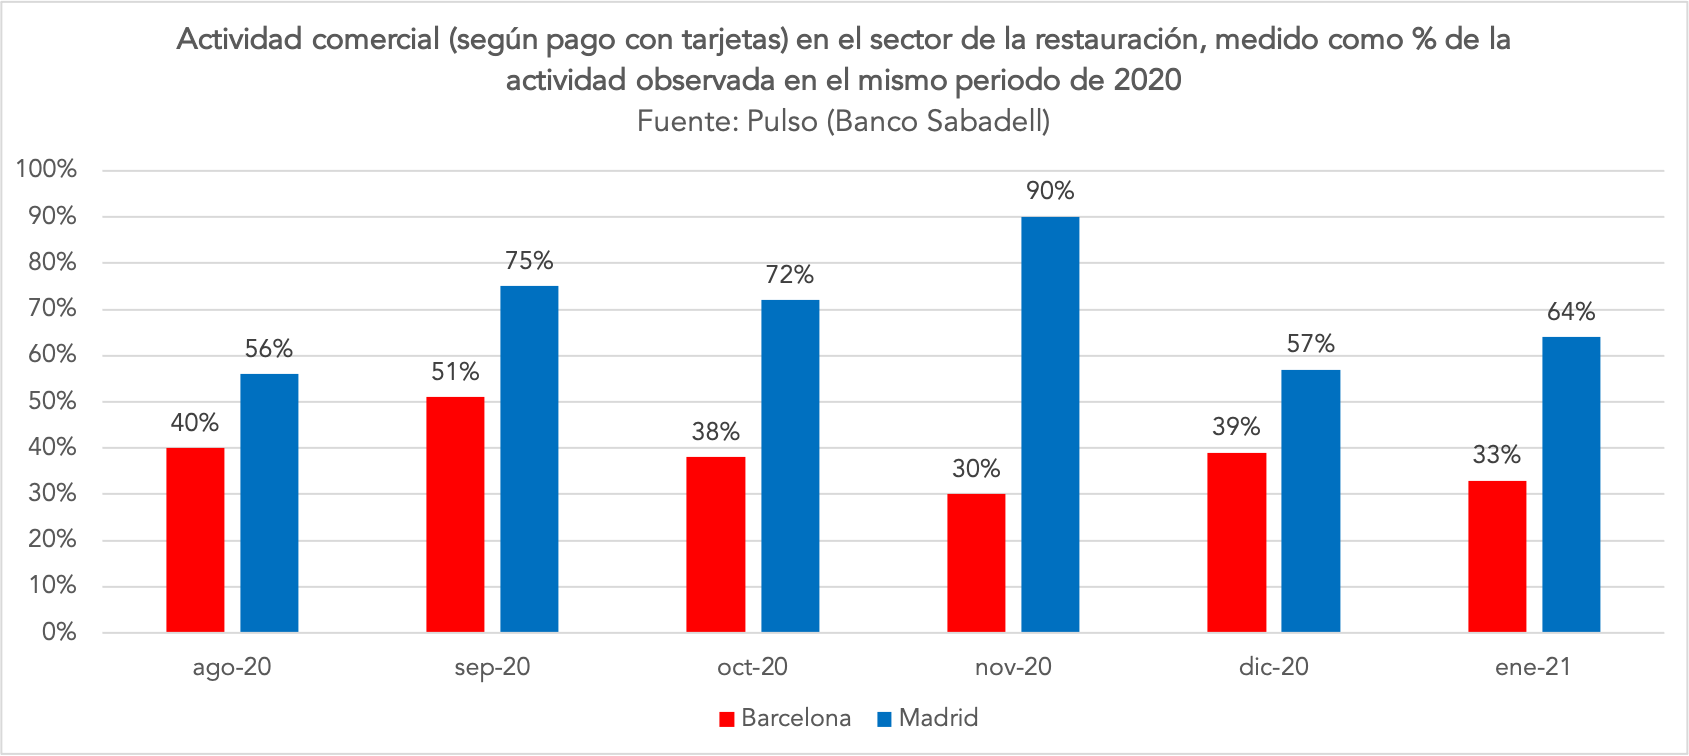 2-actividad-restauracion-madrid-barcelona.png